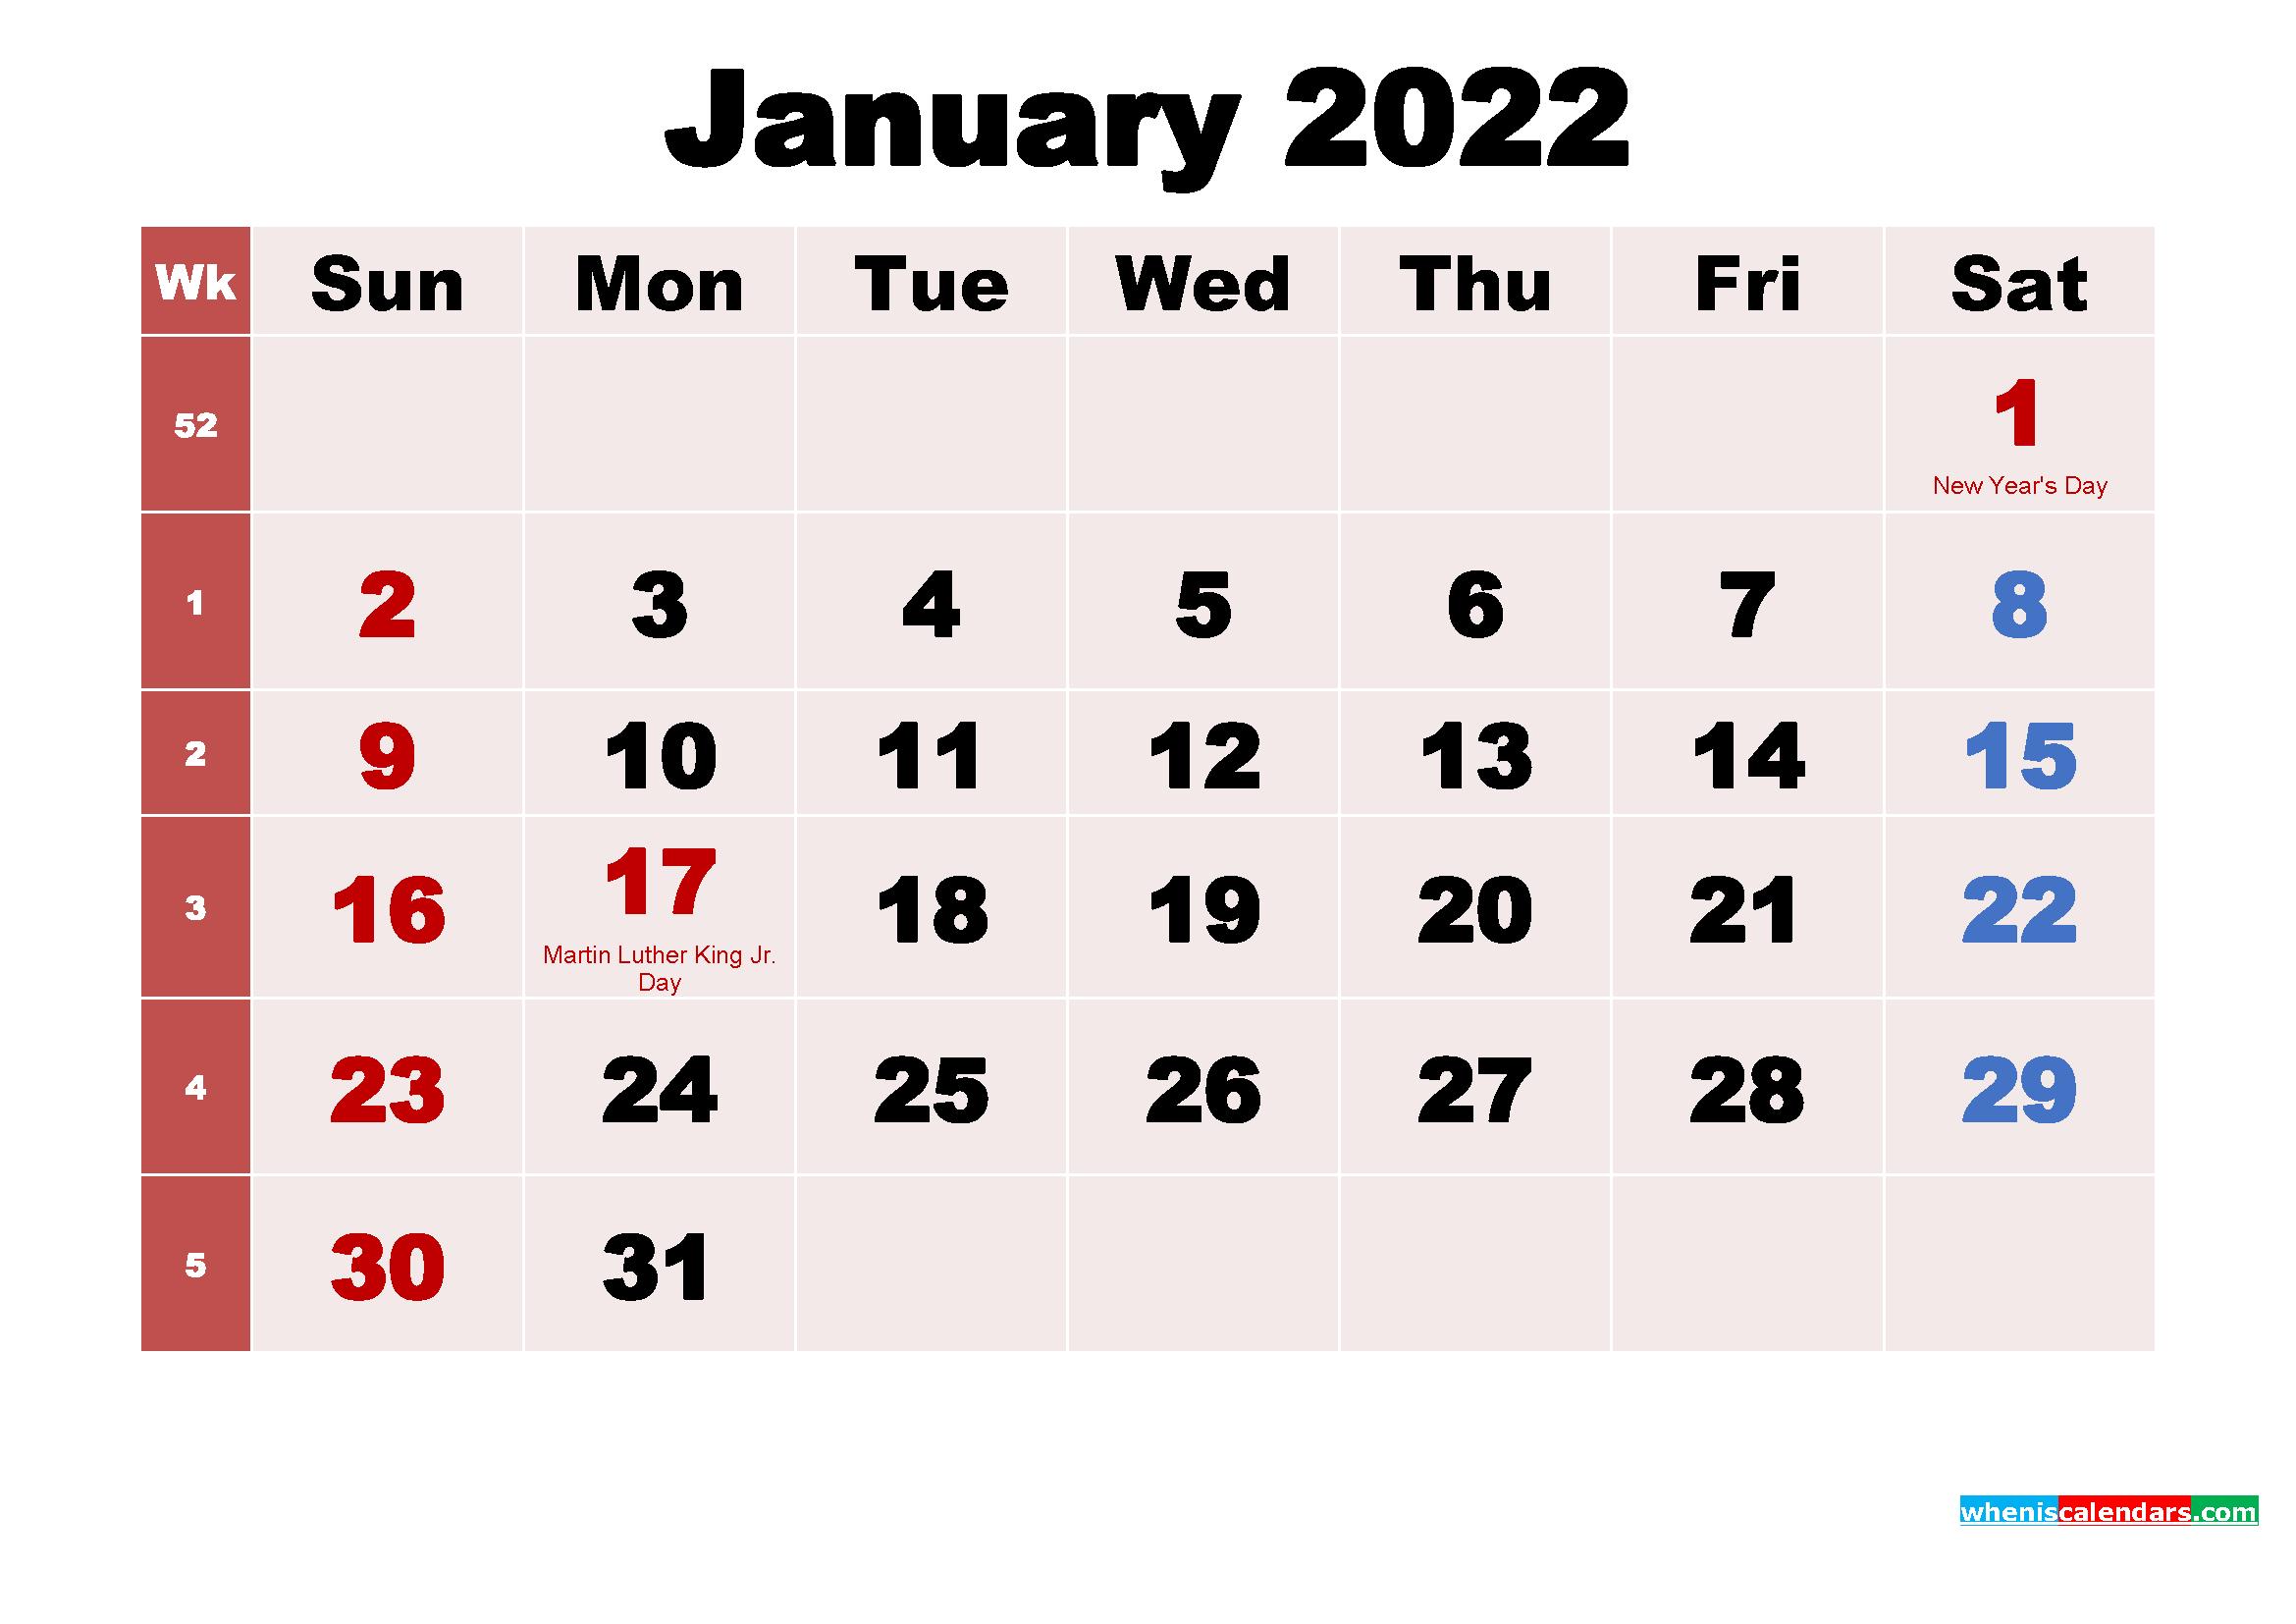 Free Printable January 2022 Calendar With Holidays As Word Pertaining To January 2022 Calendar Printable Free